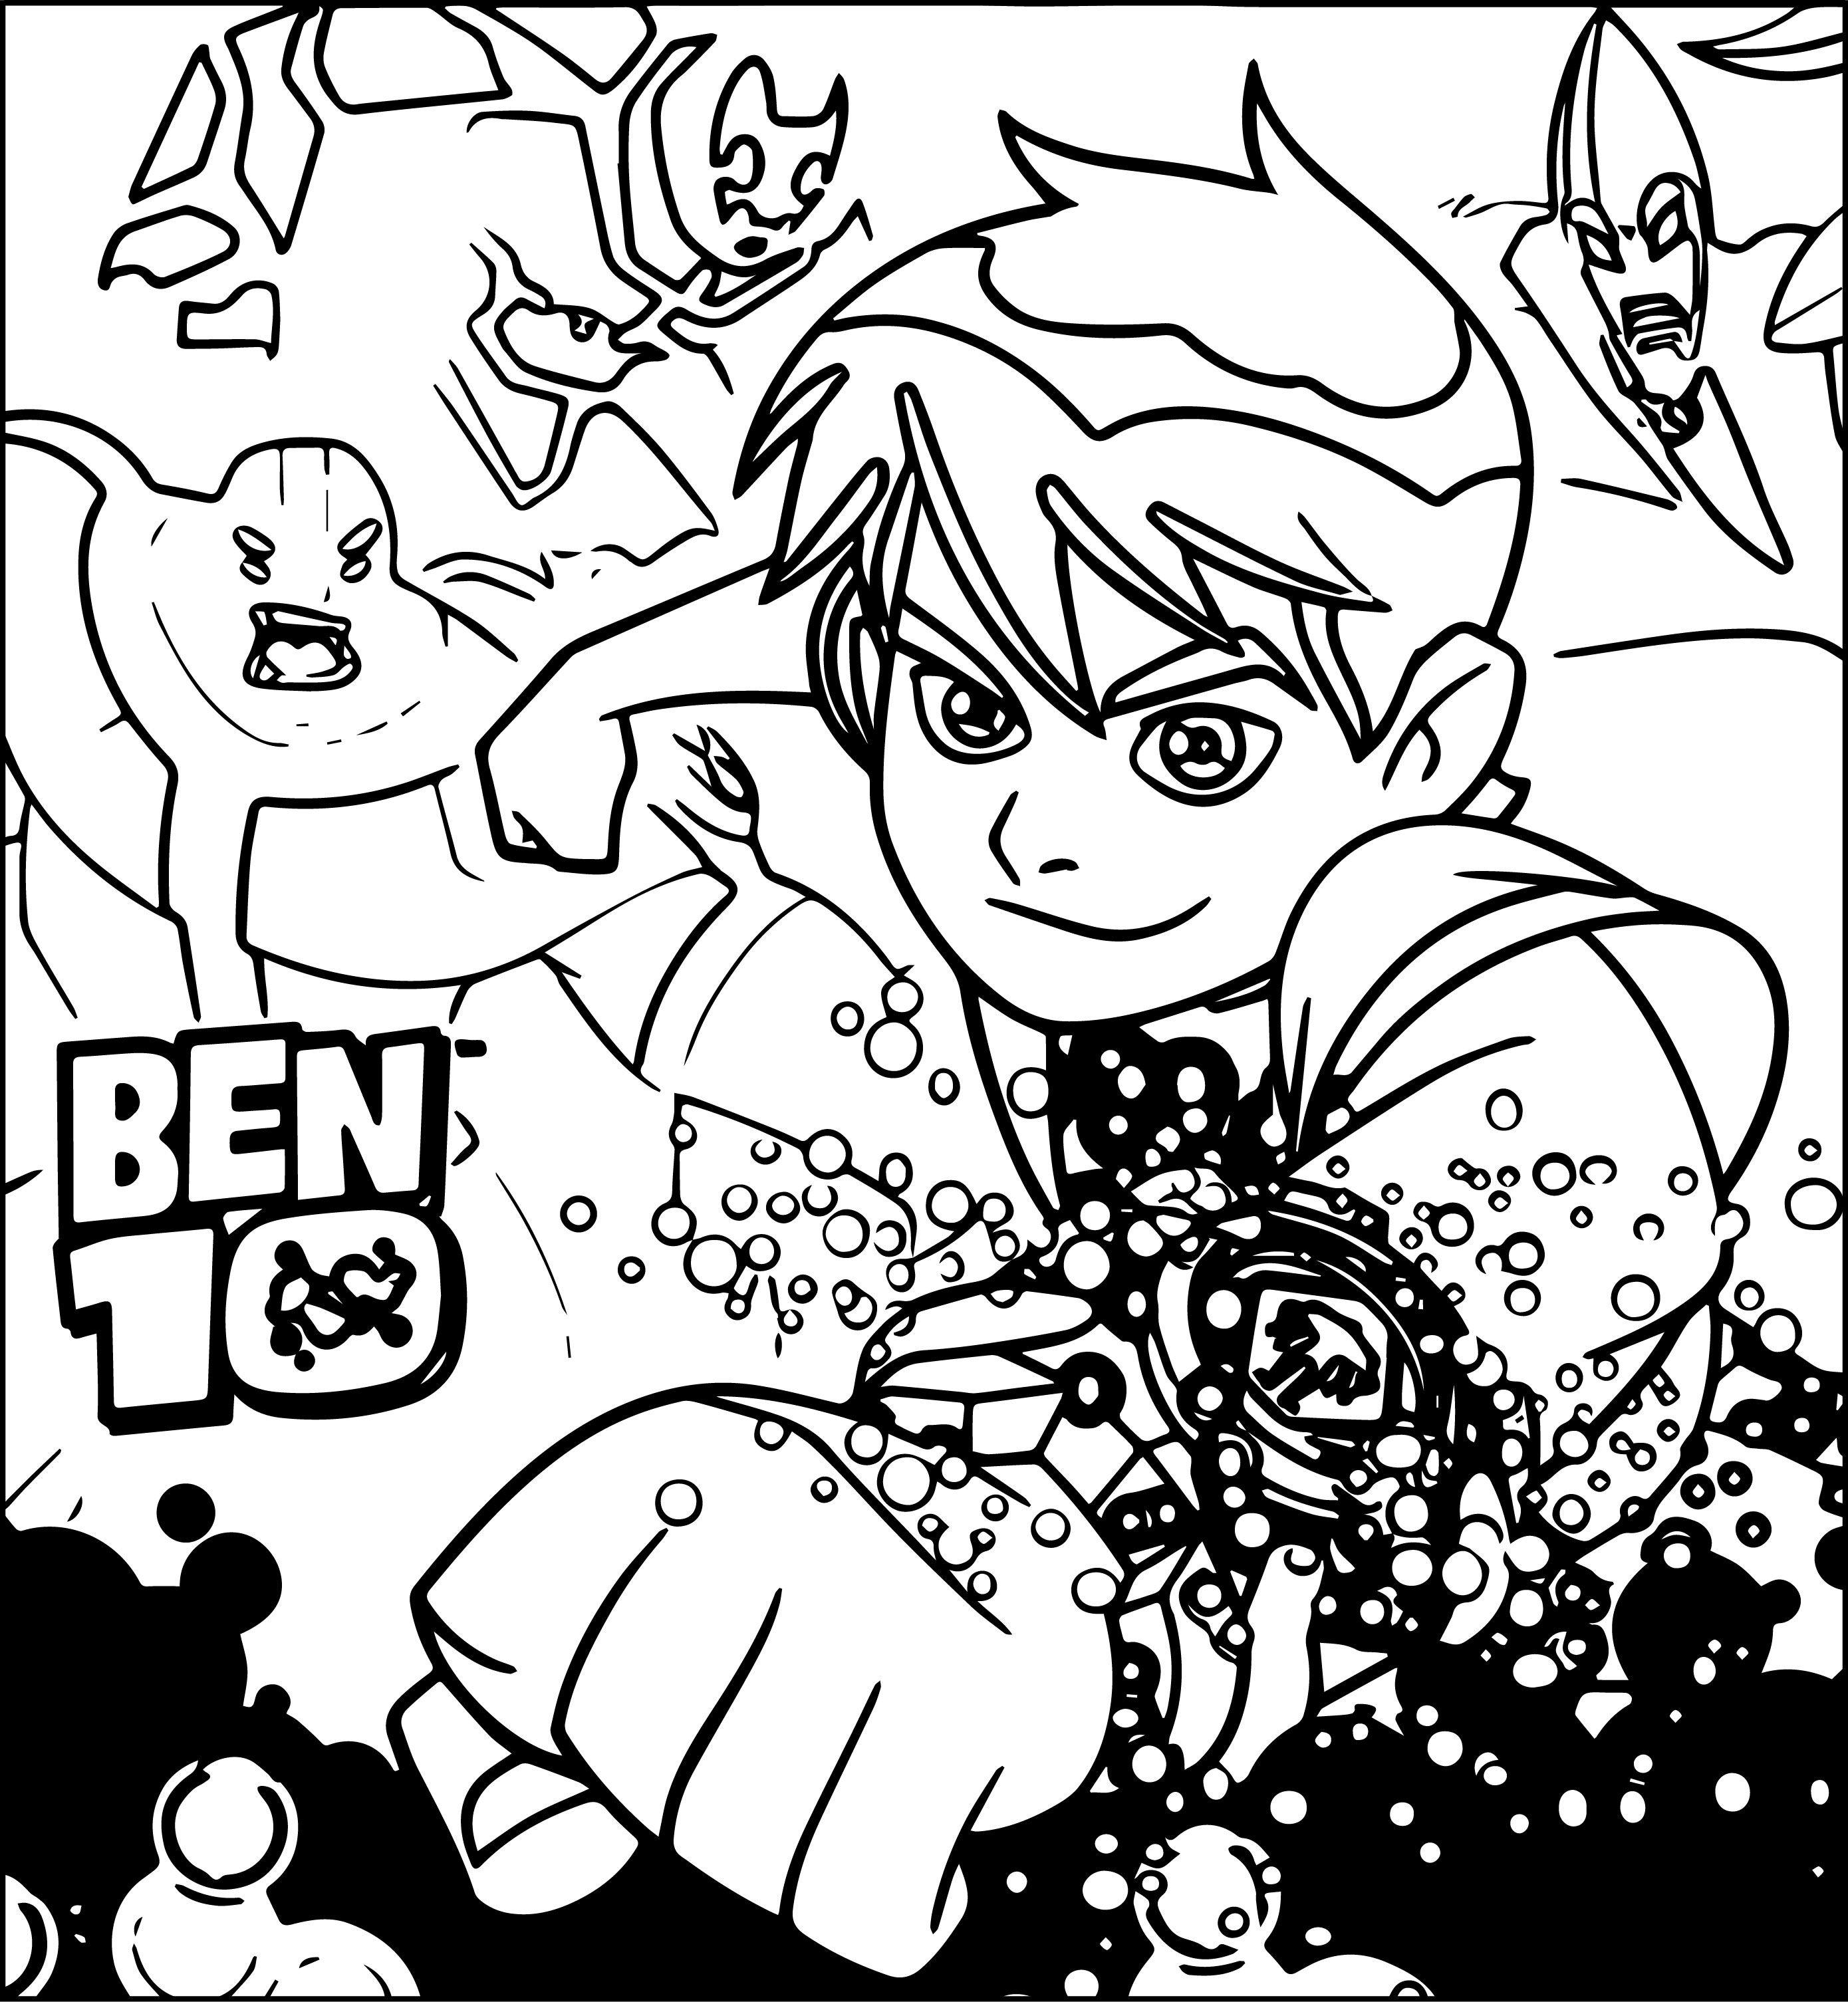 Benten Ben10 Coloring Pages